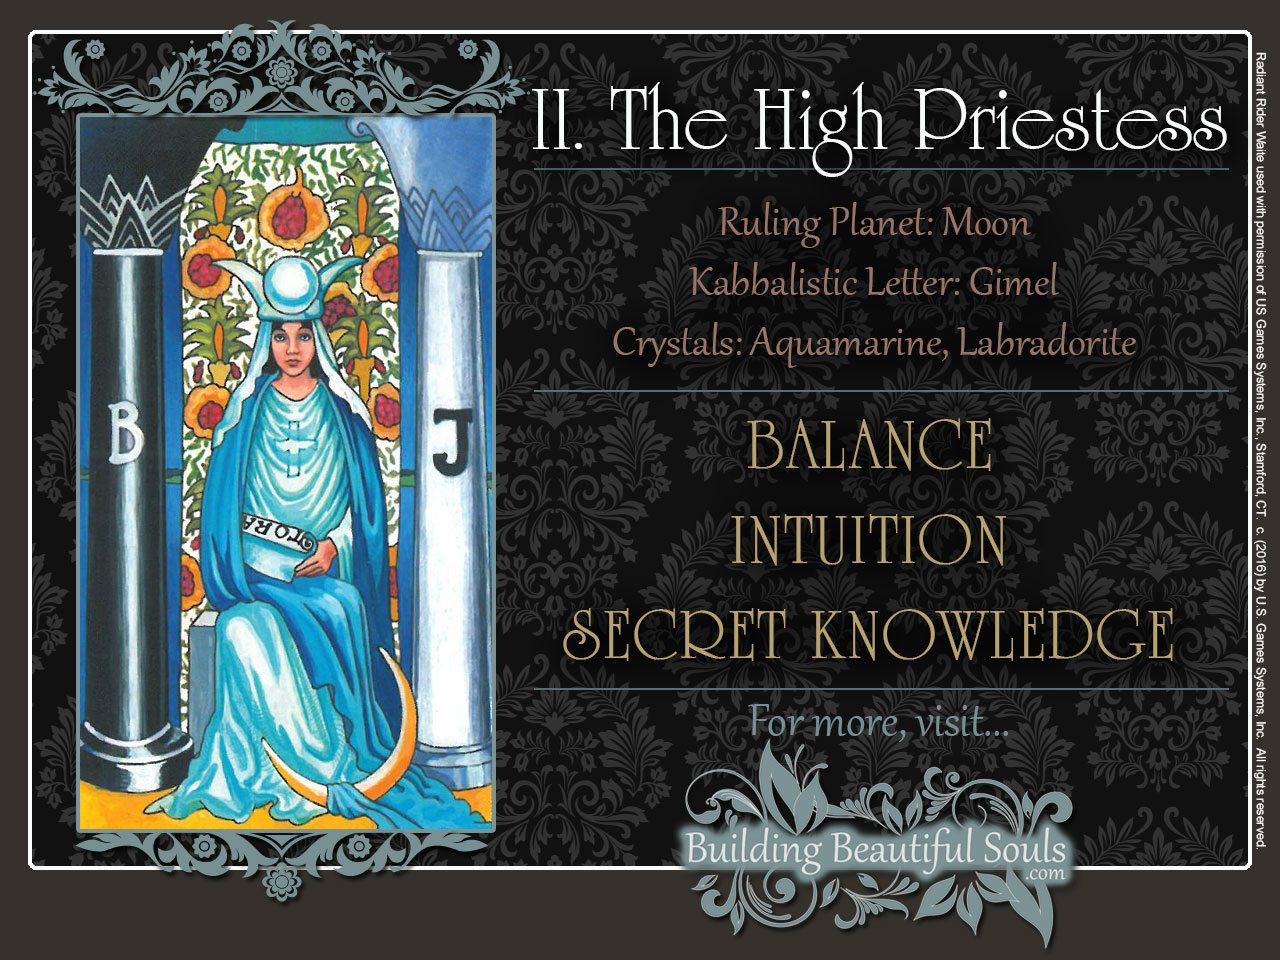 High Priestess Tarot Card Meanings